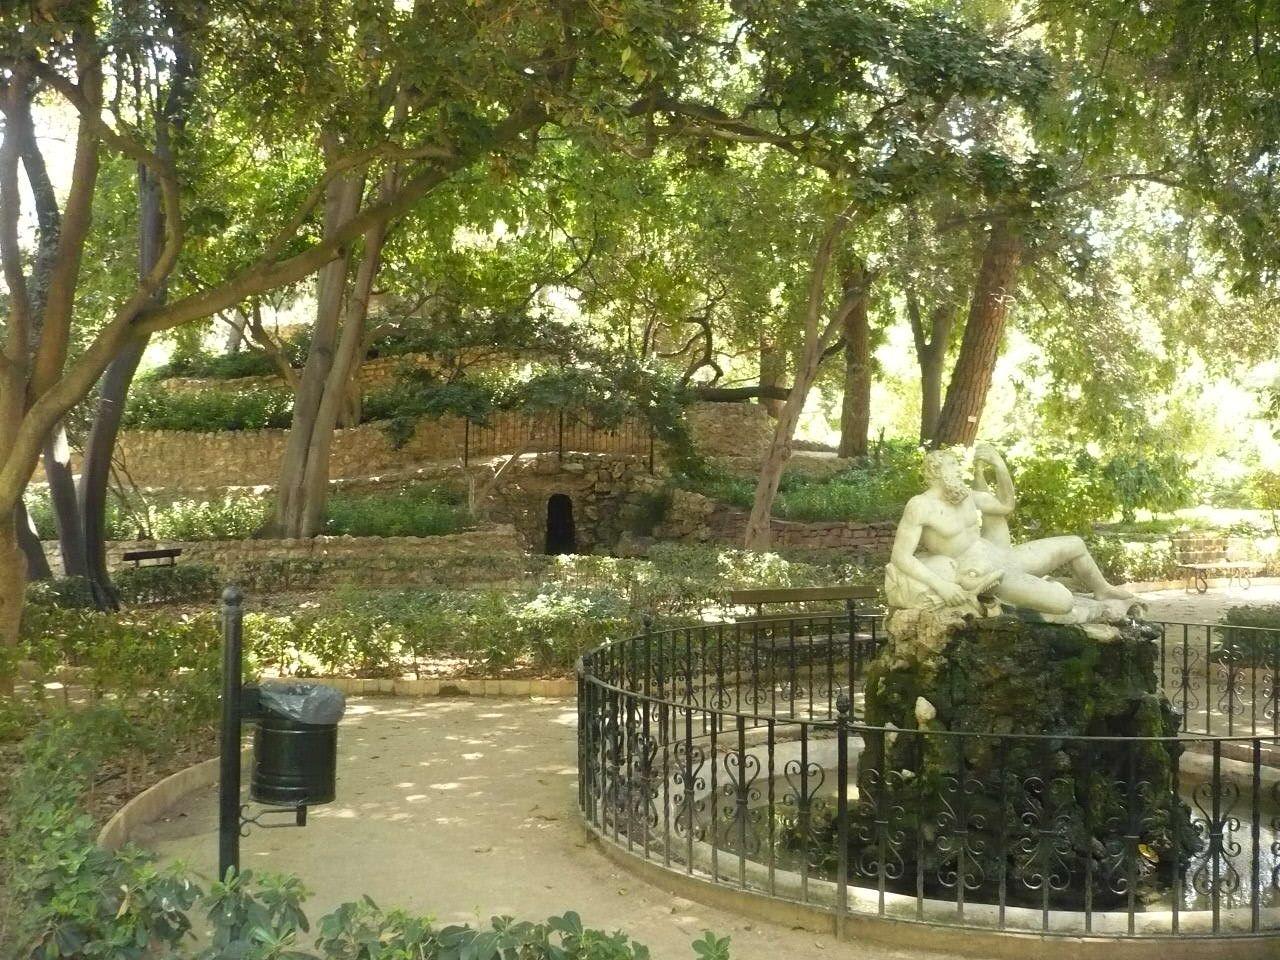 Jardines de monforte lista roja del patrimonio for Jardines de monforte valencia